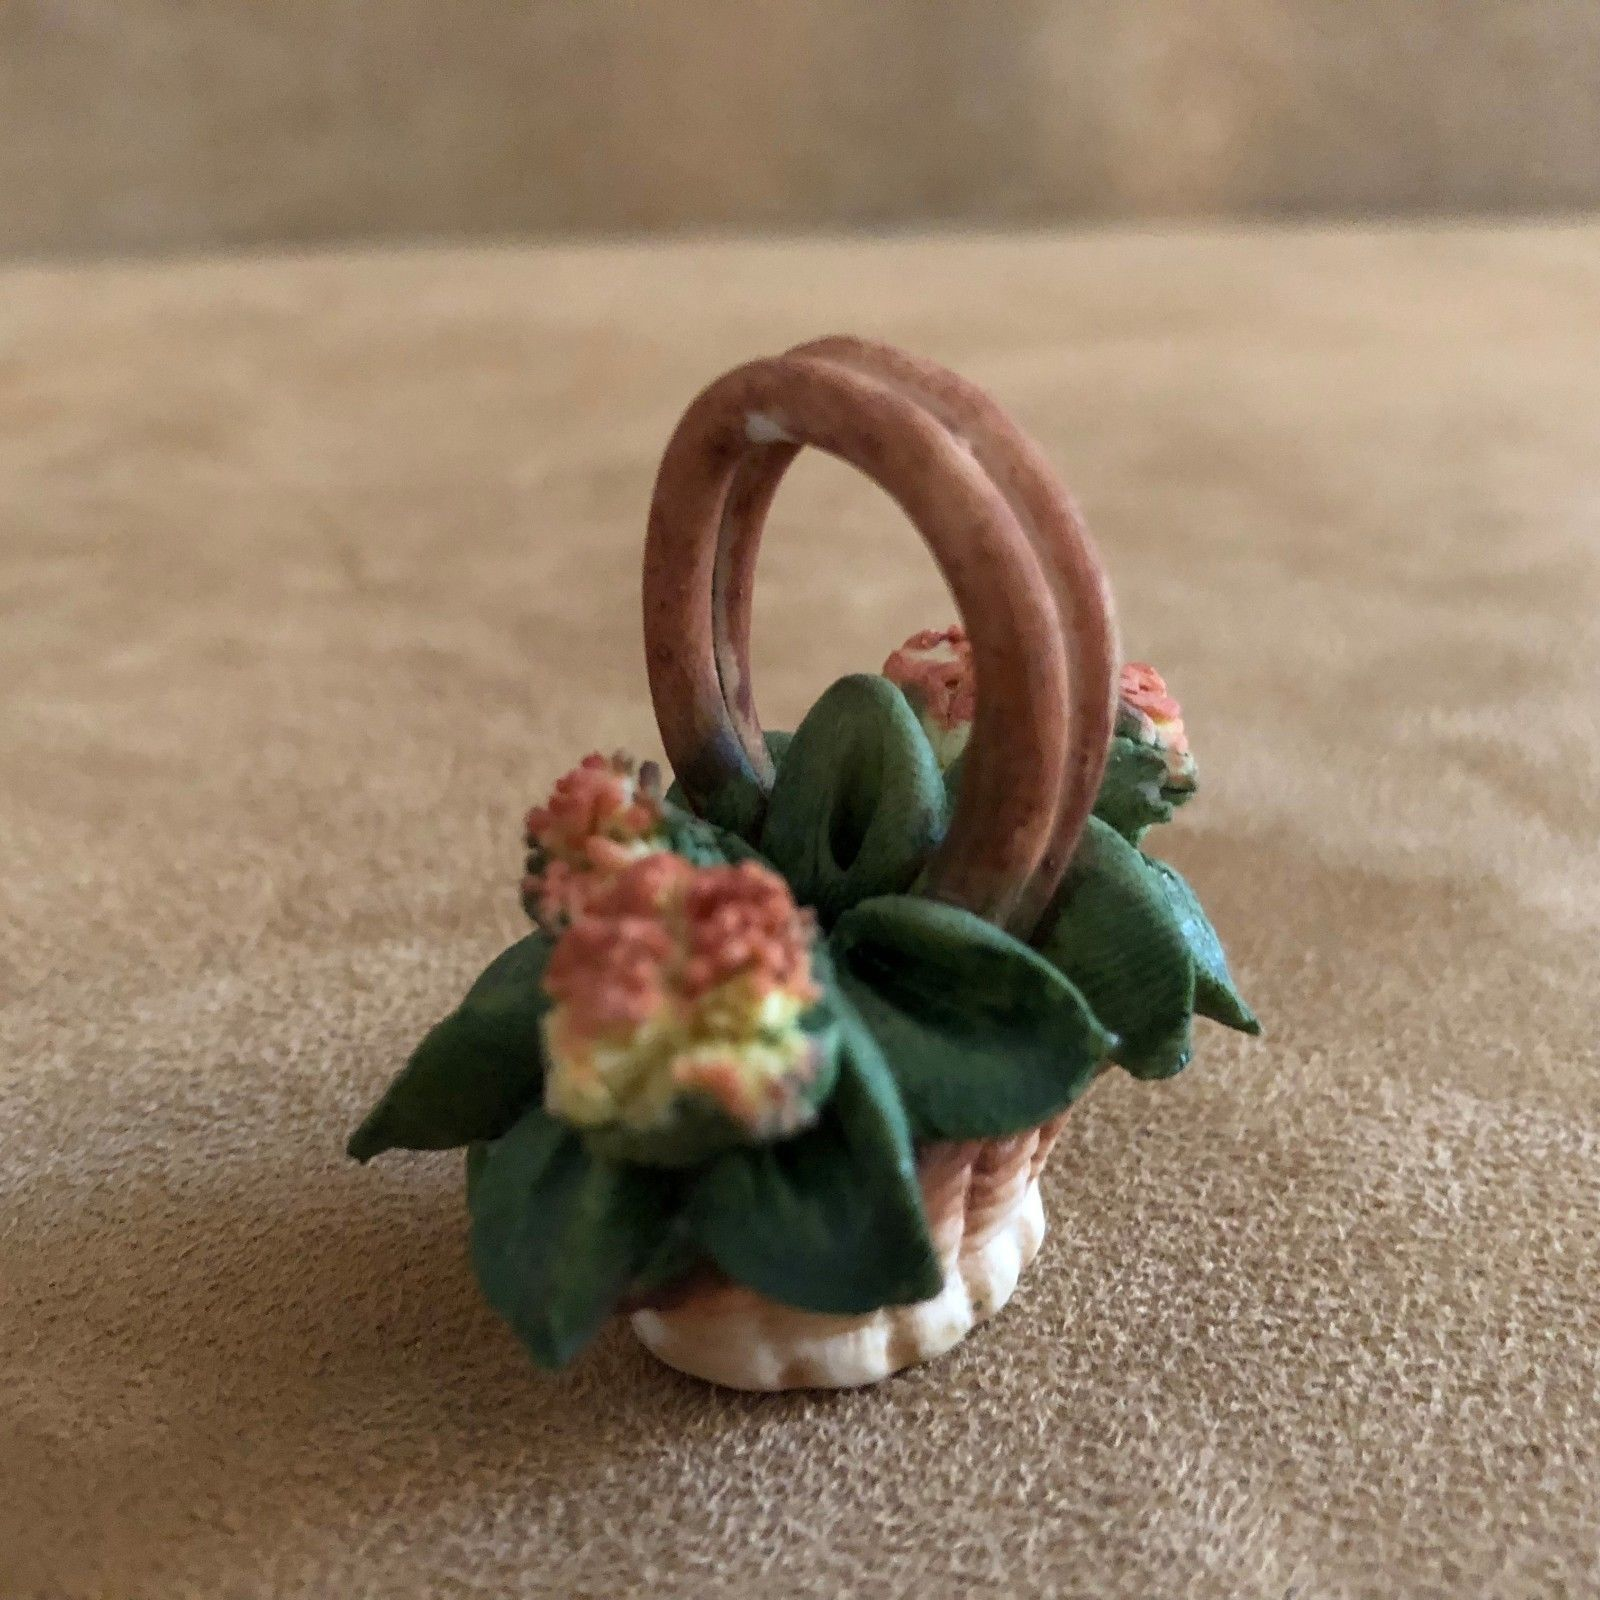 Collectibles Capodimonte Albertini Collection Porcelain Italy Home Decor Pink Flower Vtg